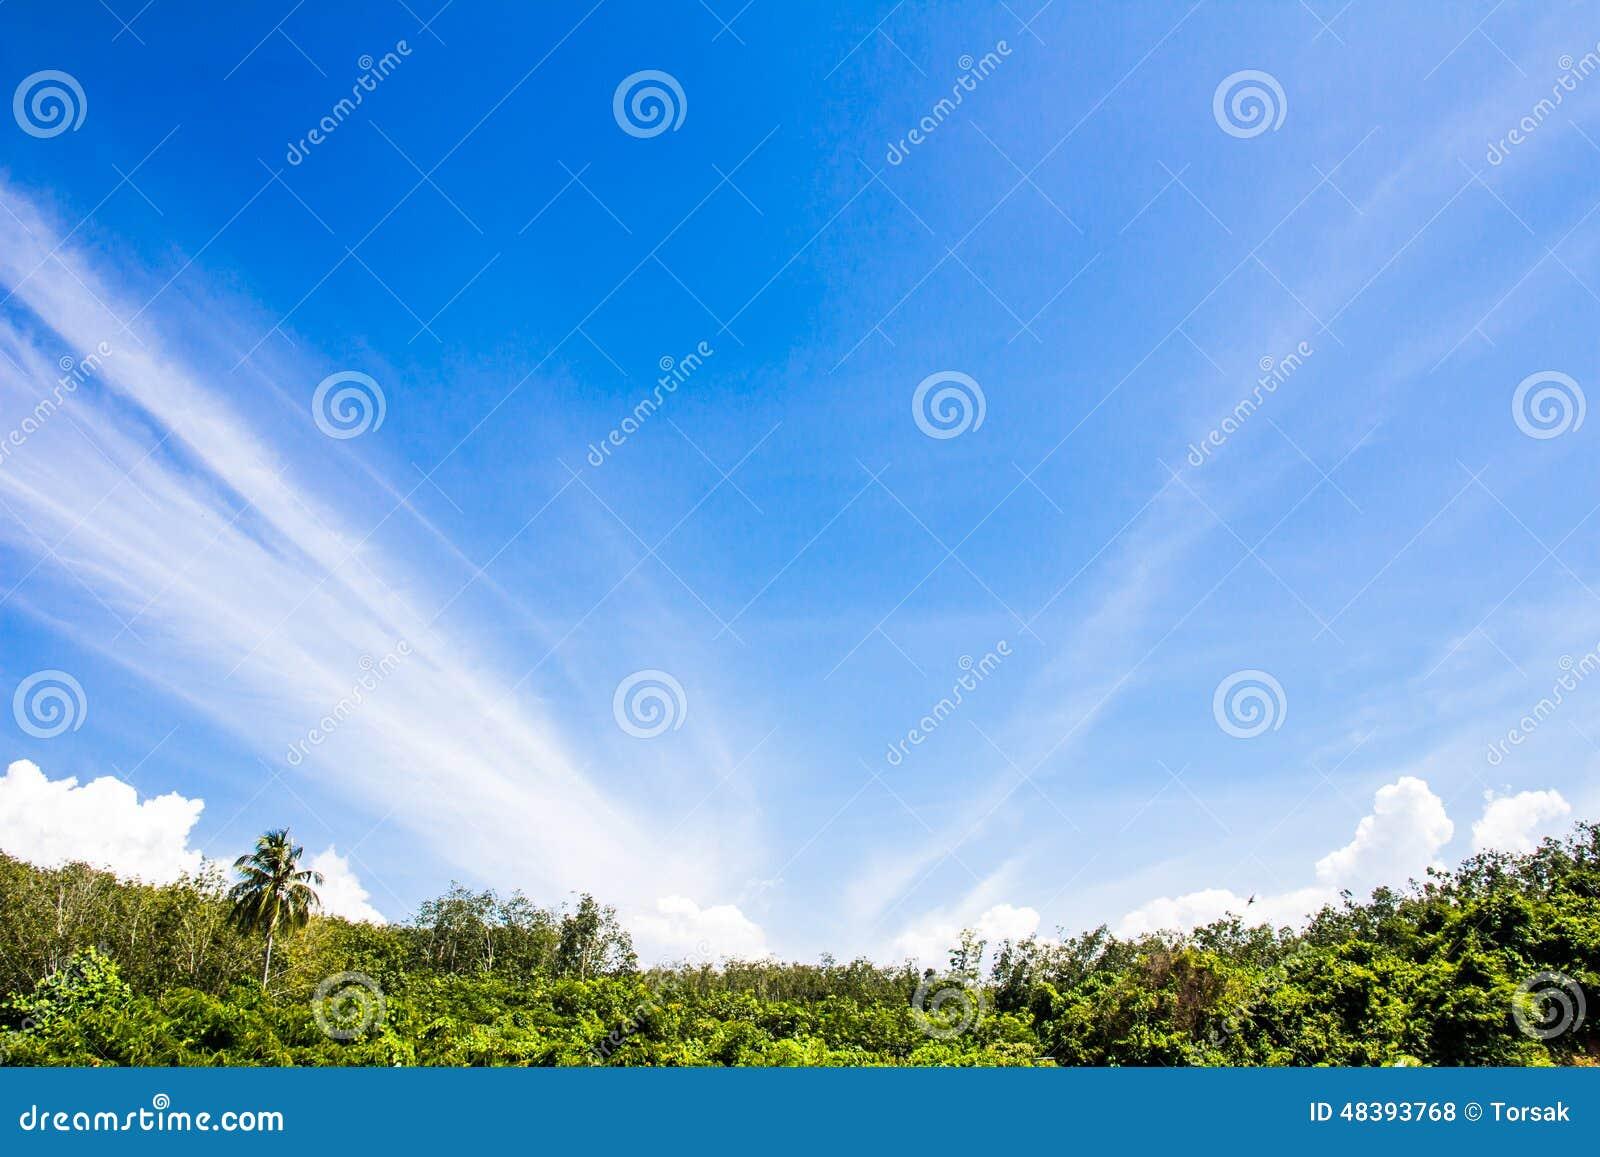 Beauty natural blue sky